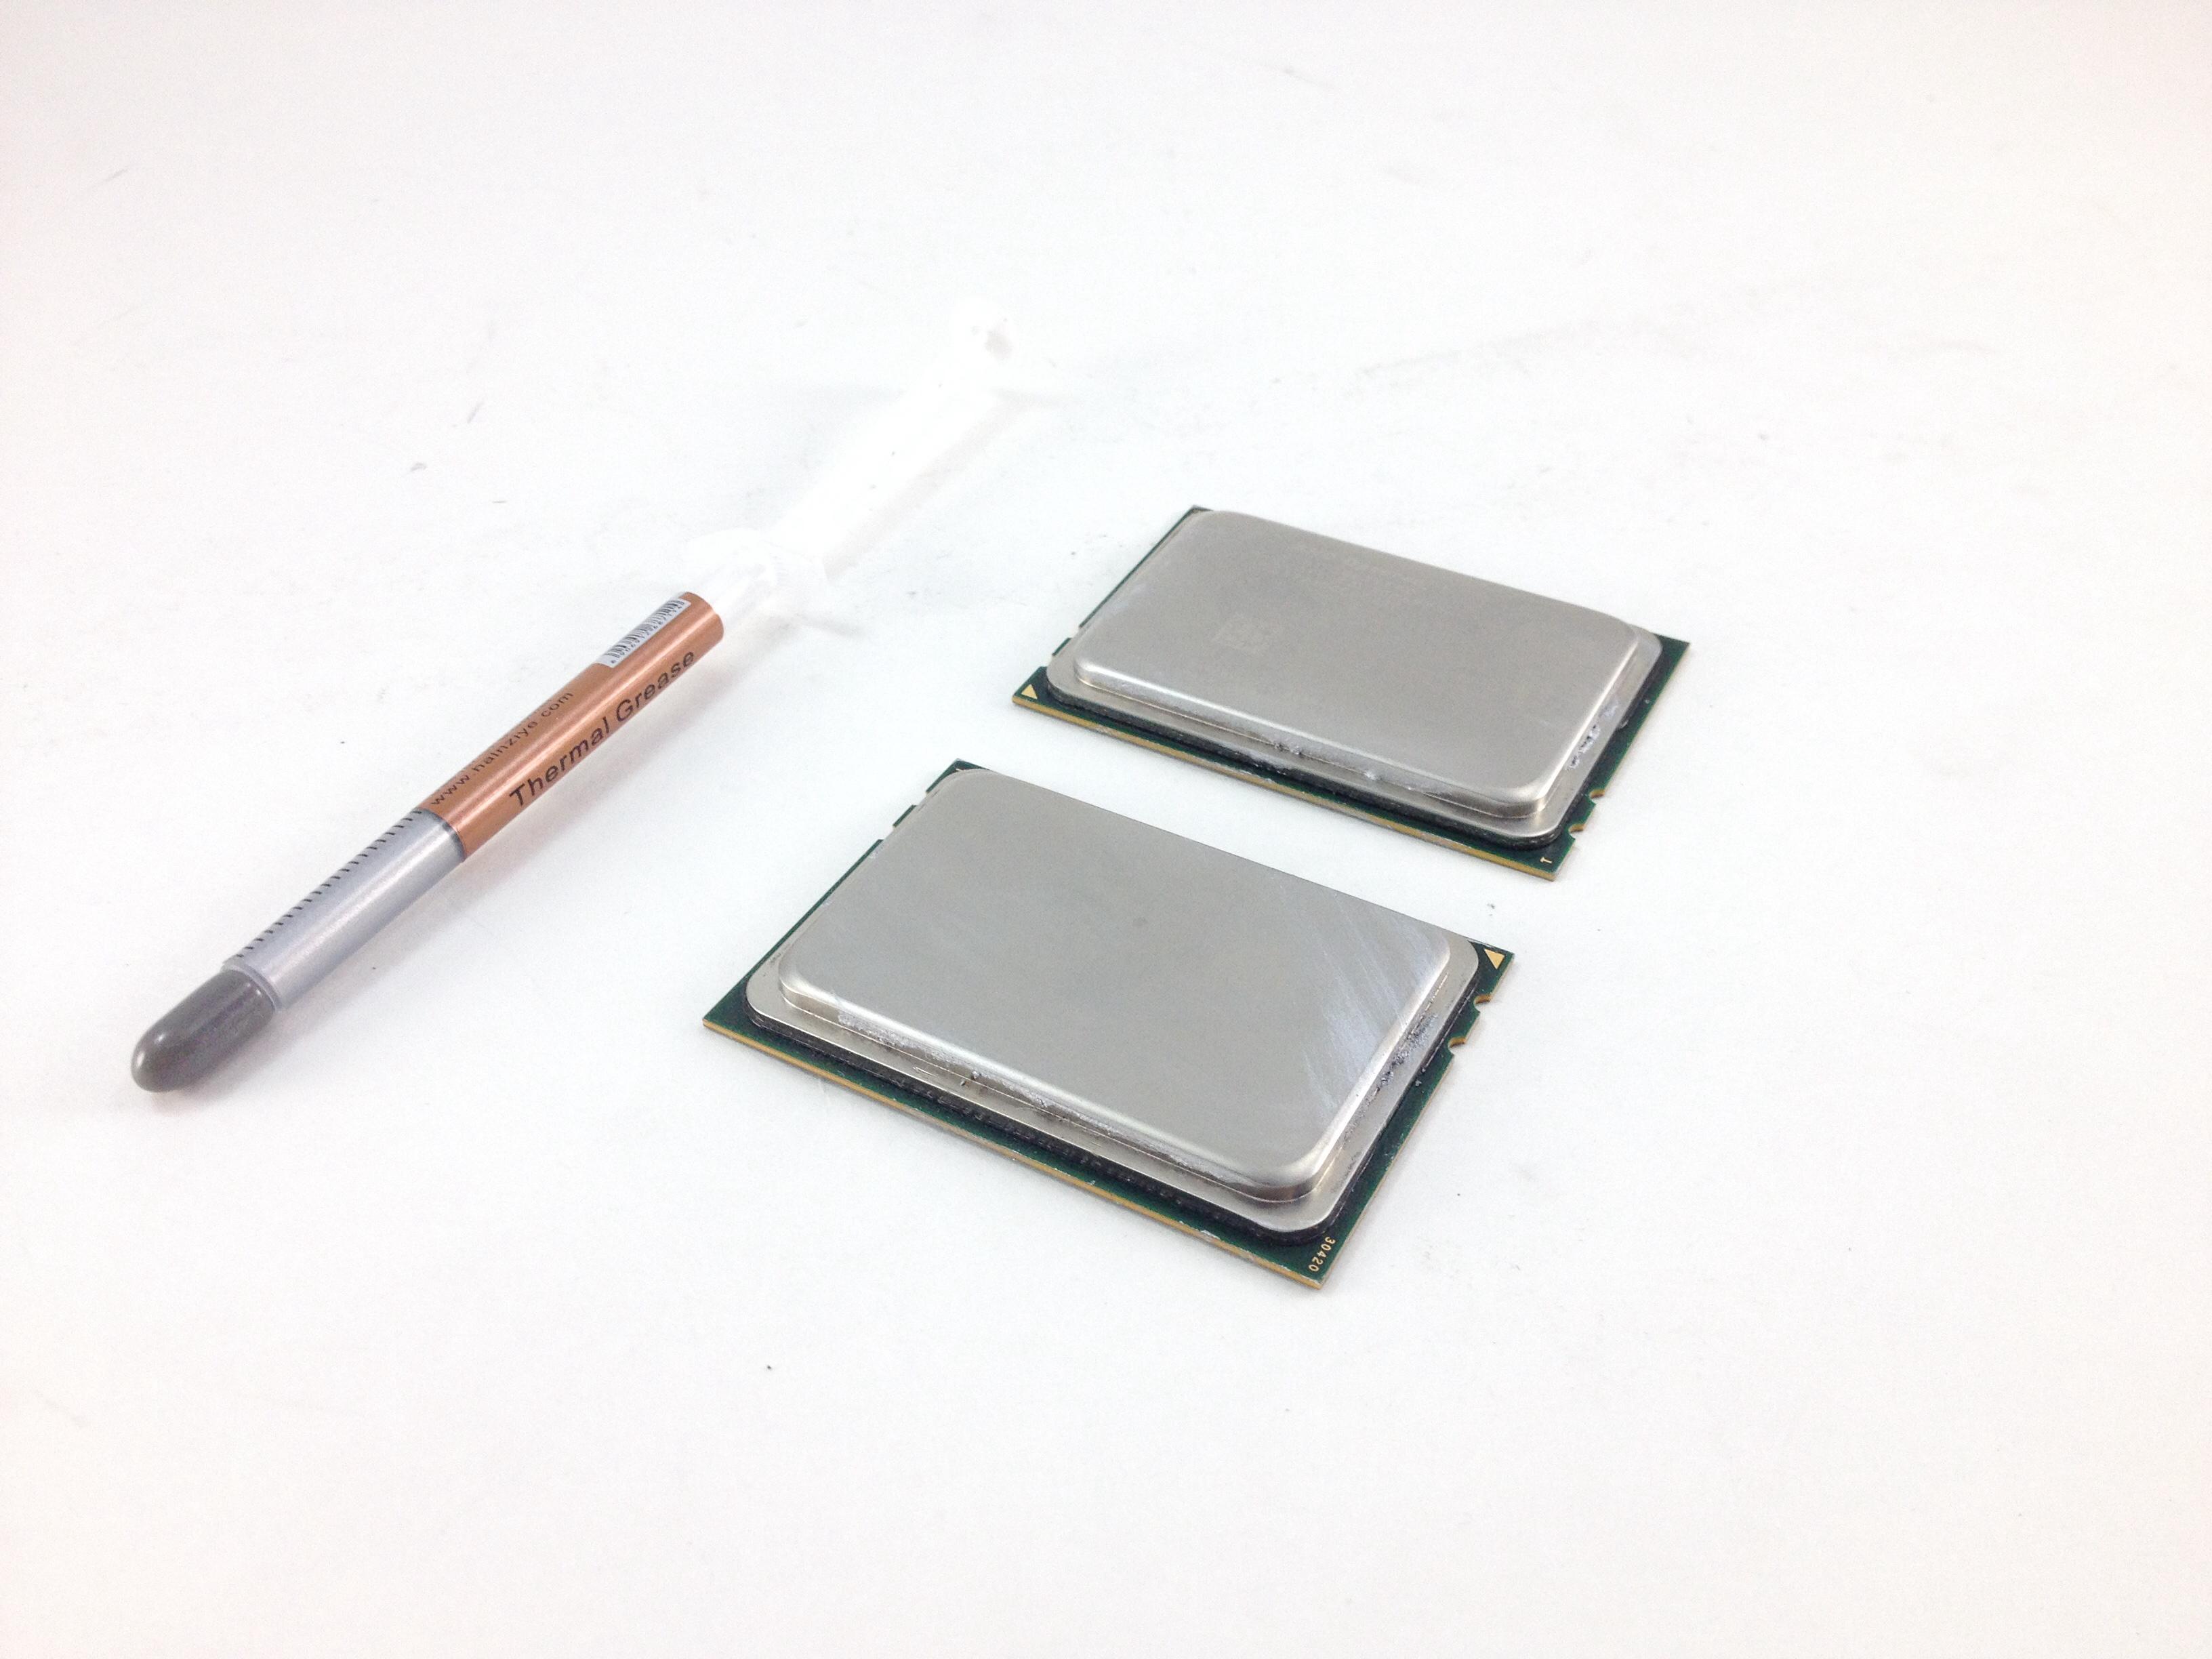 AMD Opteron 2384 2.70 GHz Quad Core 6 MB Cache Processor (OS2384WAL4DGI)